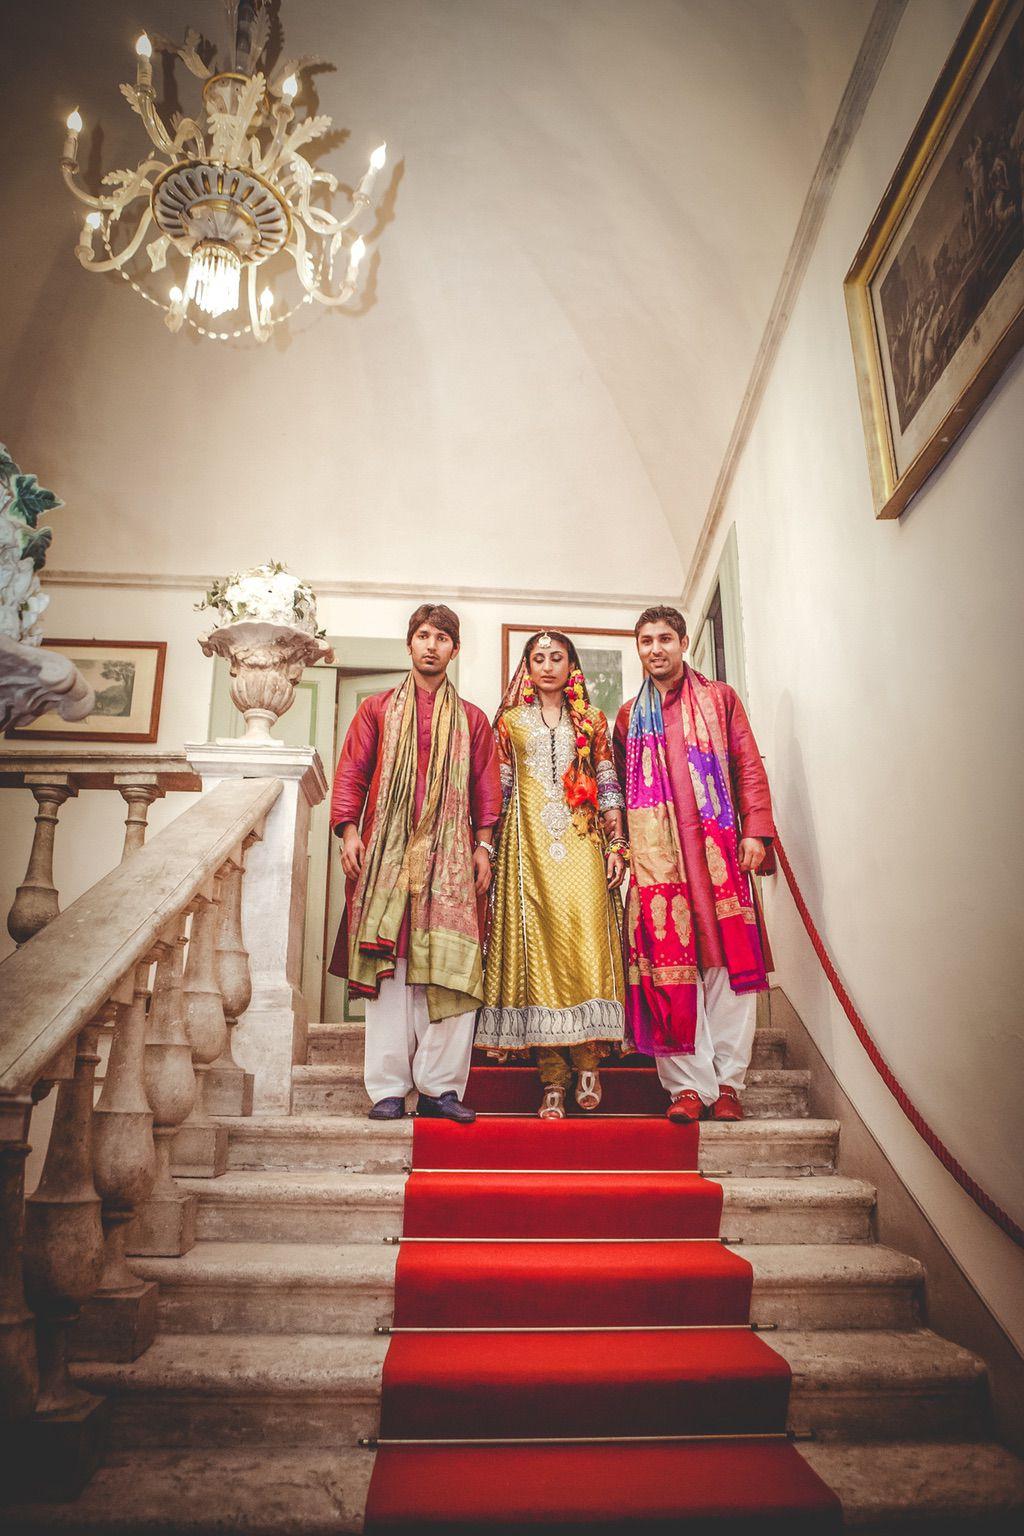 Sana-Safinaz-traditional-dresses-Nikah-ceremony-Pakistani-wedding-villa-catignano-018